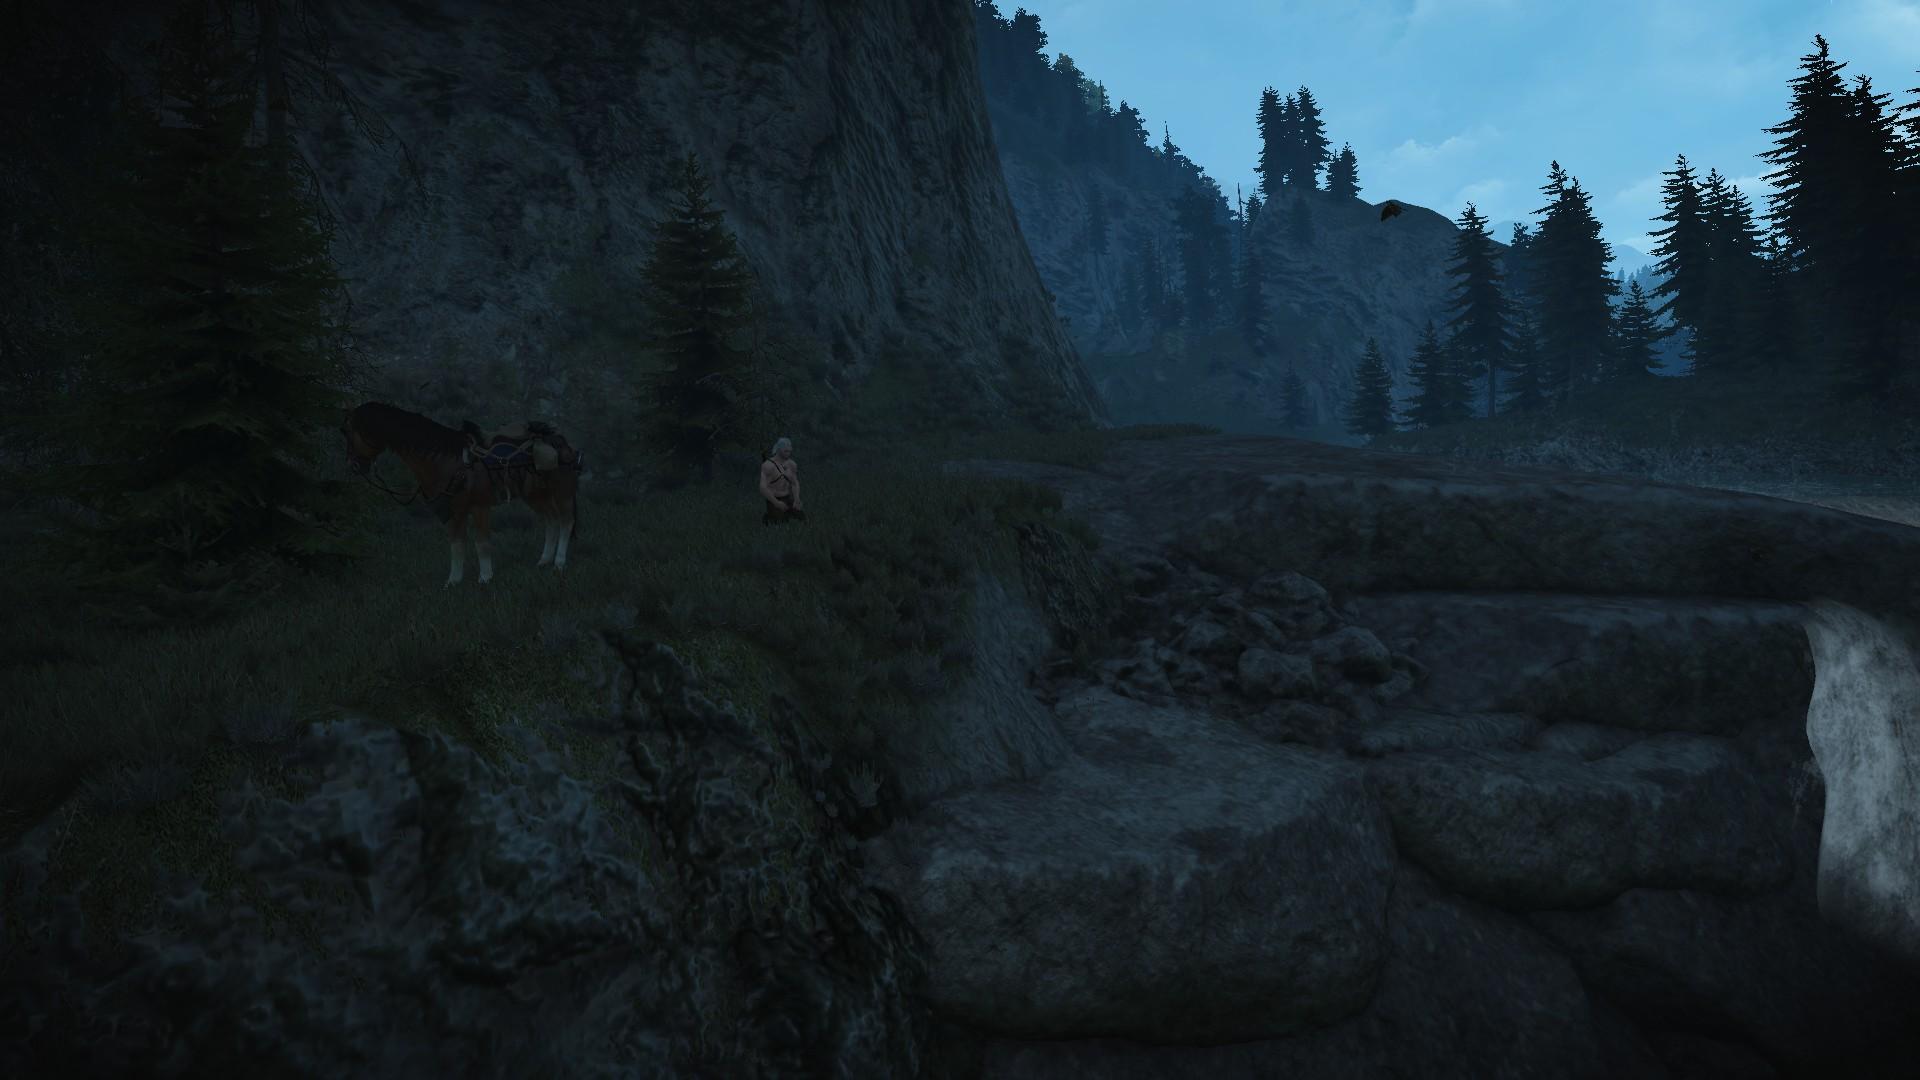 The Witcher 3 Screenshot 2019.02.10 - 20.56.15.43.jpg - Witcher 3: Wild Hunt, the